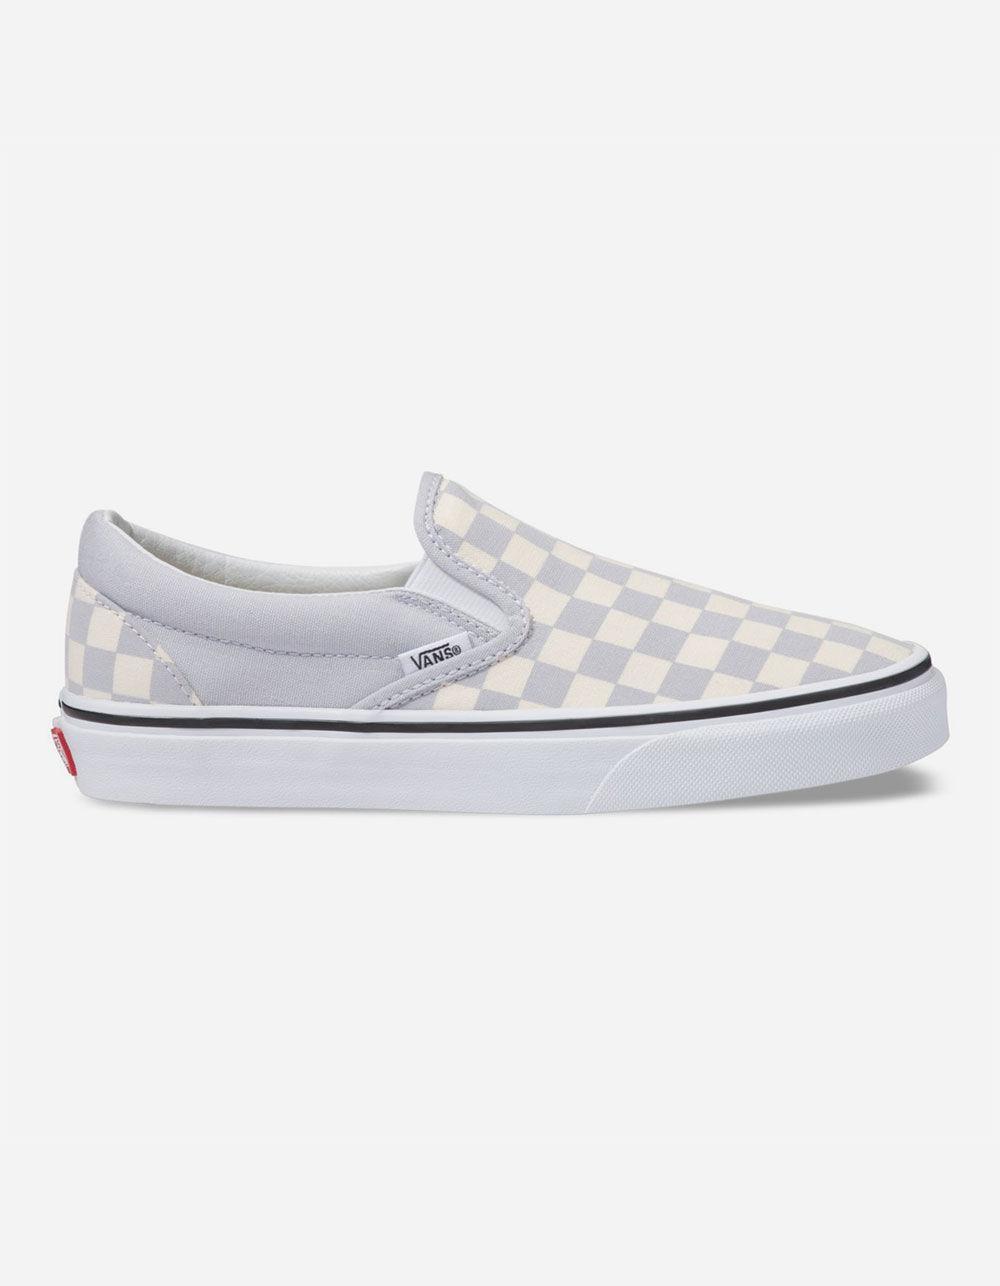 Lyst - Vans Checkerboard Gray Dawn   True White Womens Slip-on Shoes ... 37f754cb7d4